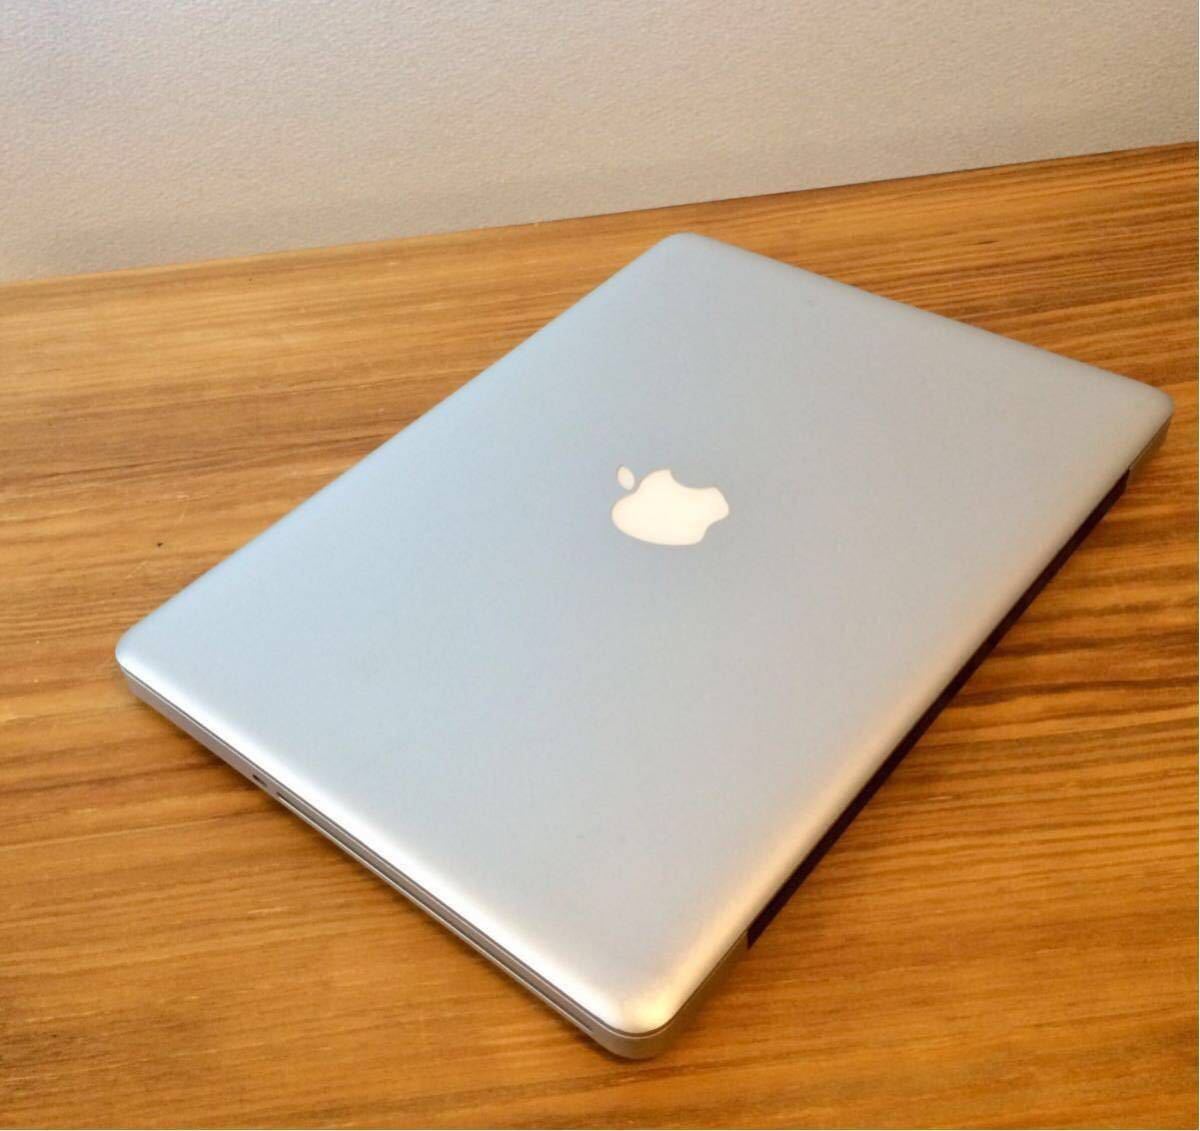 最上位最強!新品超大容量SSD960GB&新品超速メモリー16GB&大容量純正バッテリー MacBookPro MD102J/A i7 2.9GHz(3.6GHz) 最新OS対応/Mojave_画像7